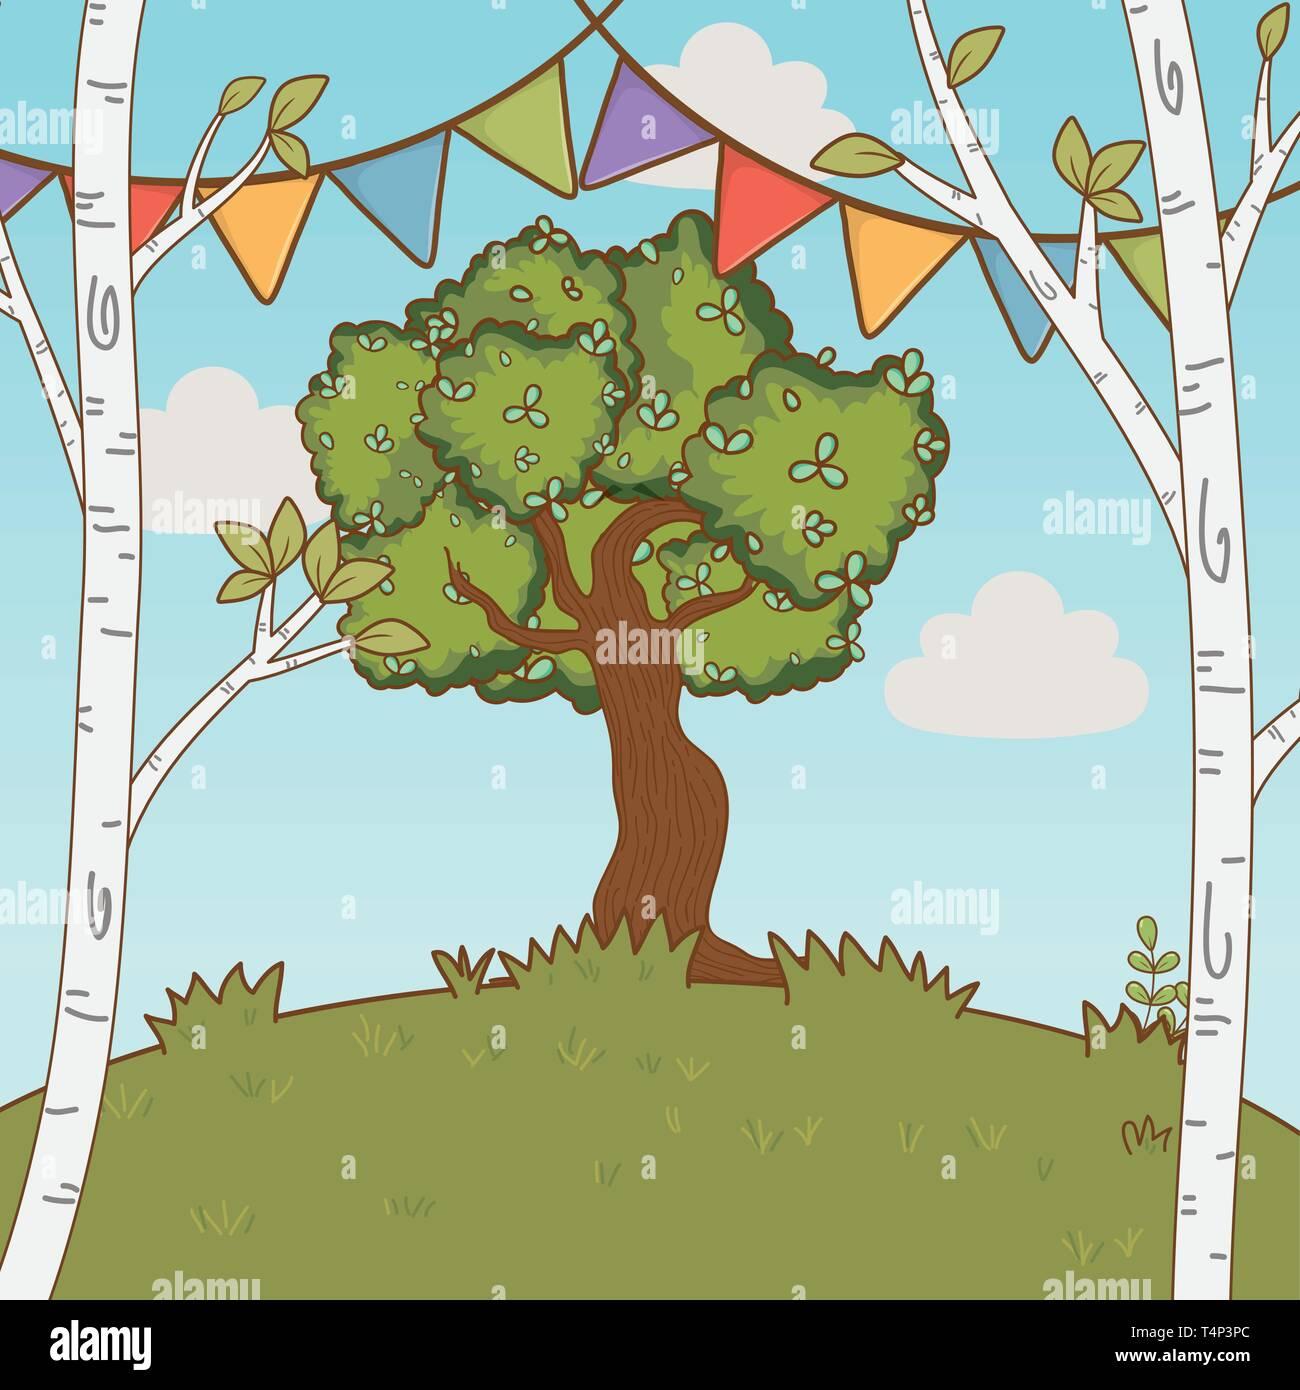 festive party outdoor scene cartoon vector illustration graphic design vector illustration graphic design Stock Vector